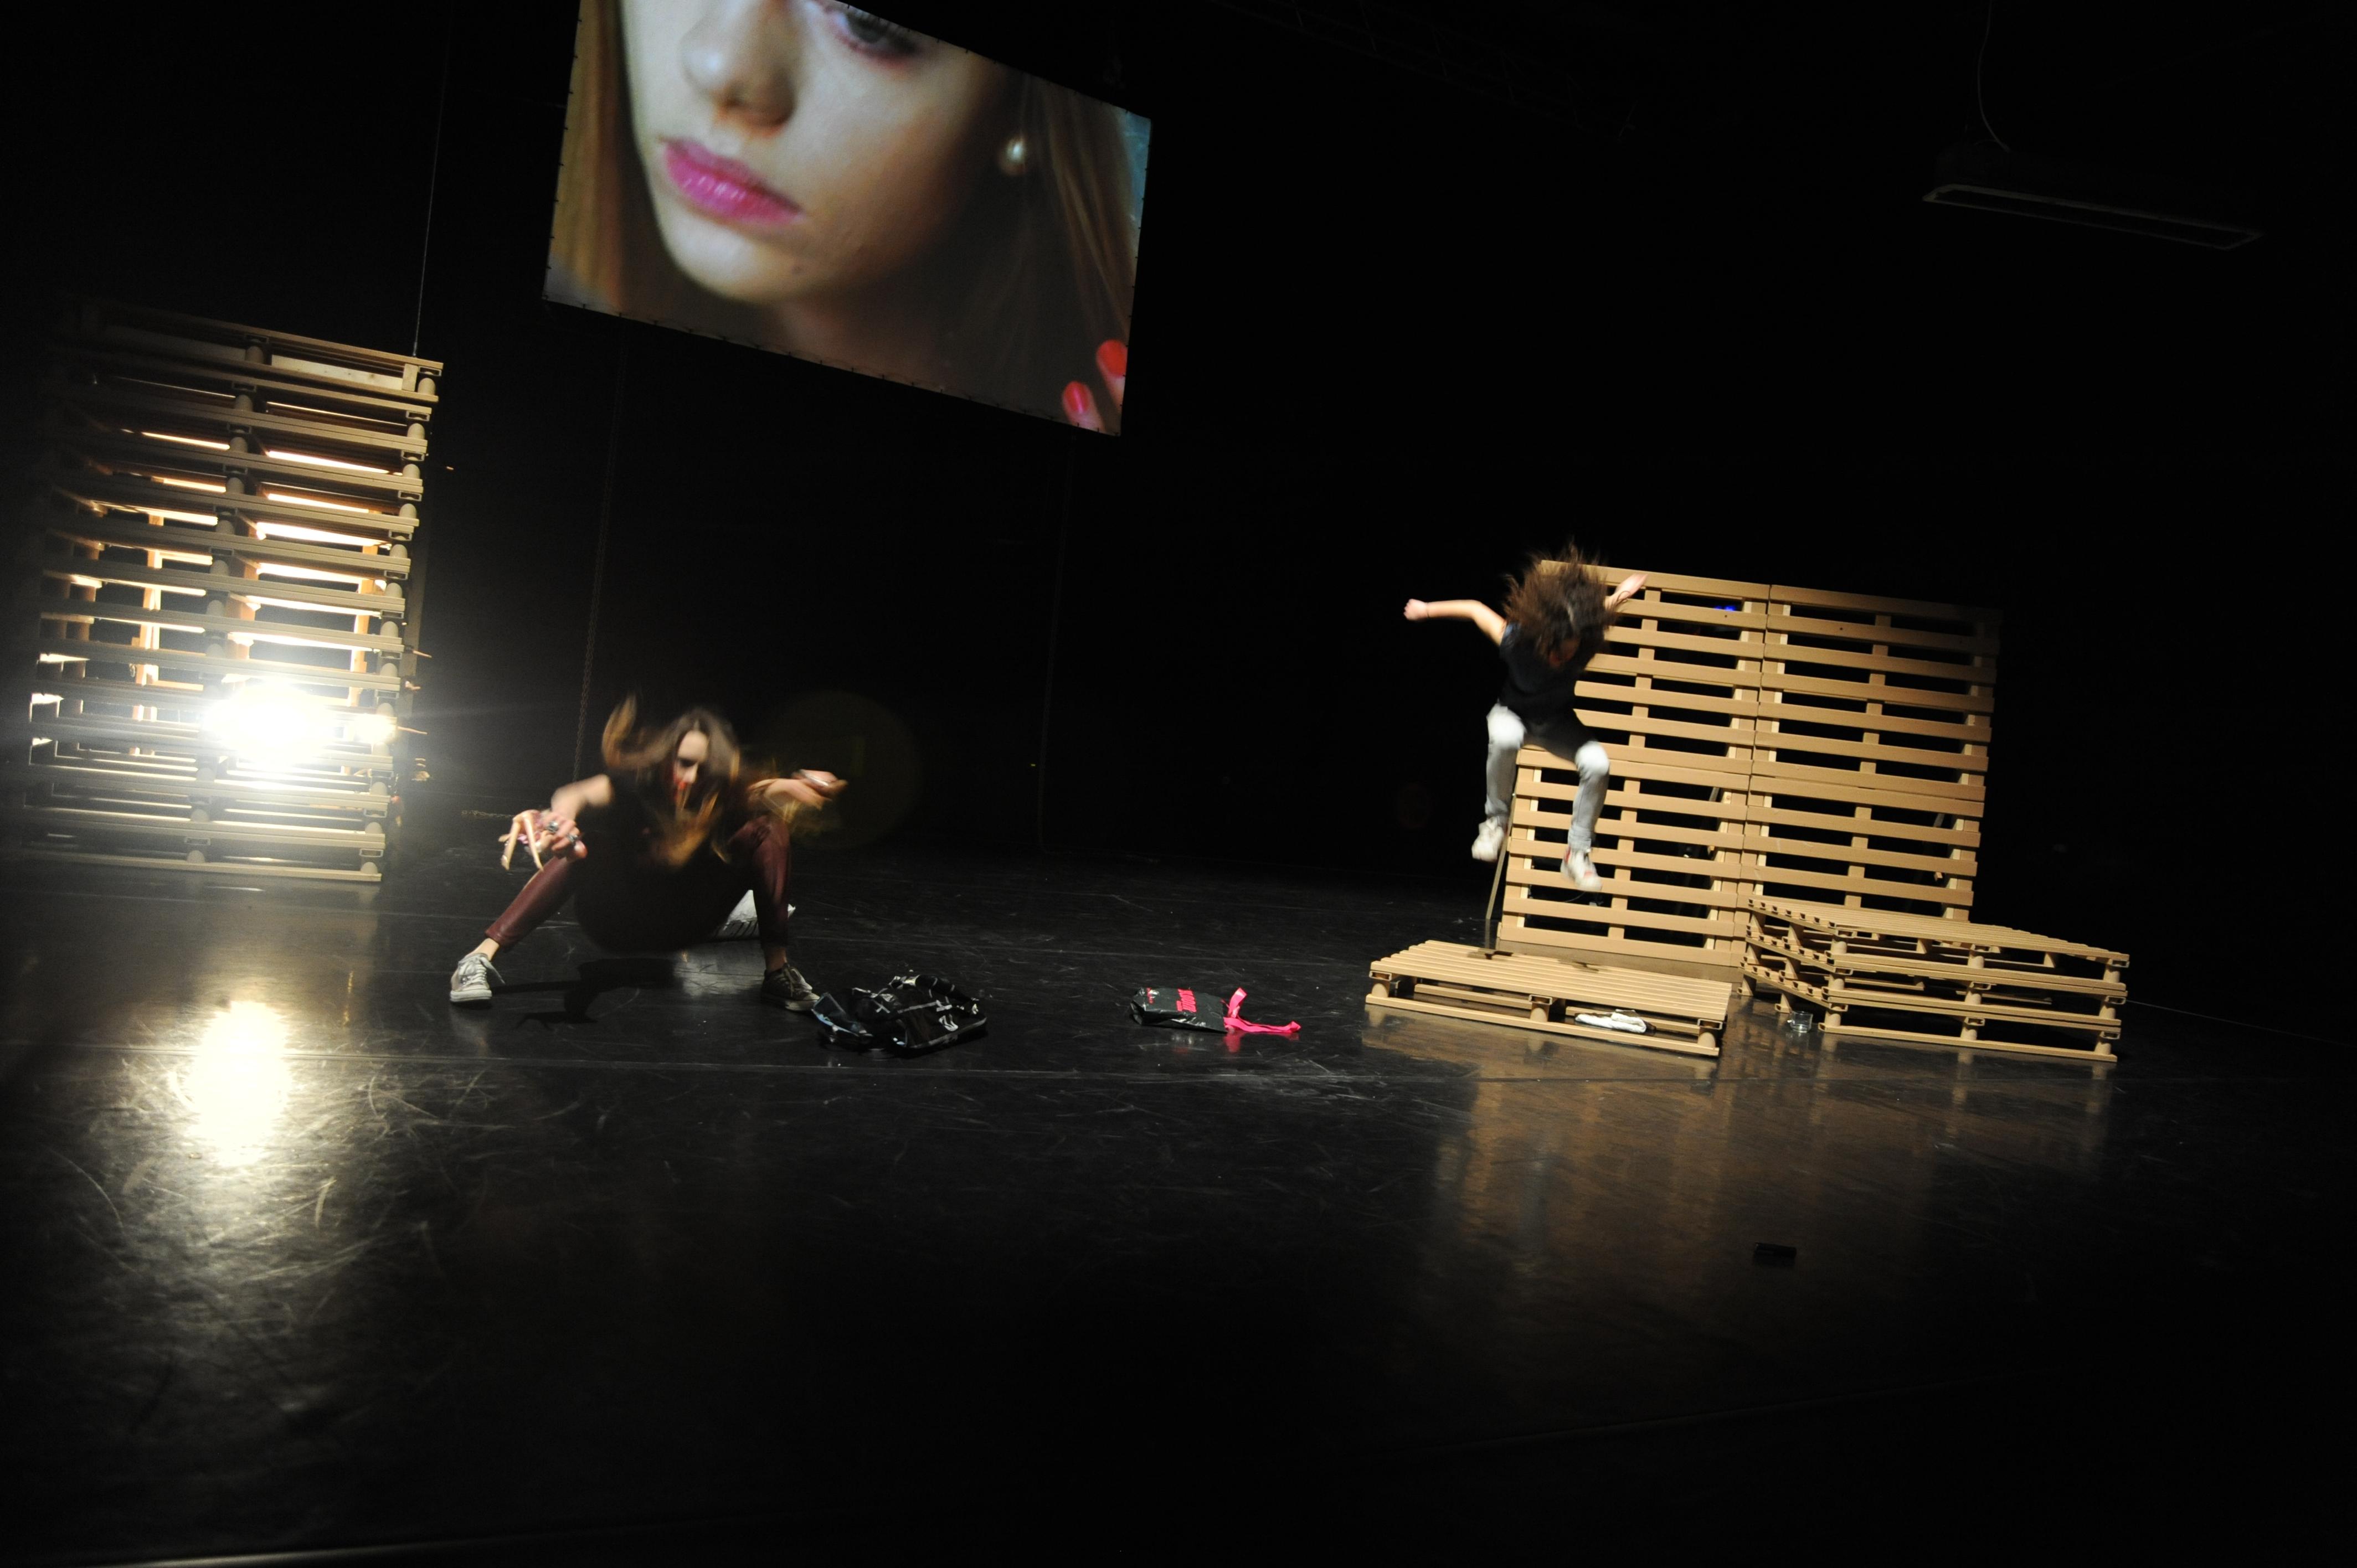 I'd either die at 27 or live 4-ever by TG Simon&IK (Annemiek van Elst & Sacha Eva van der Mast)